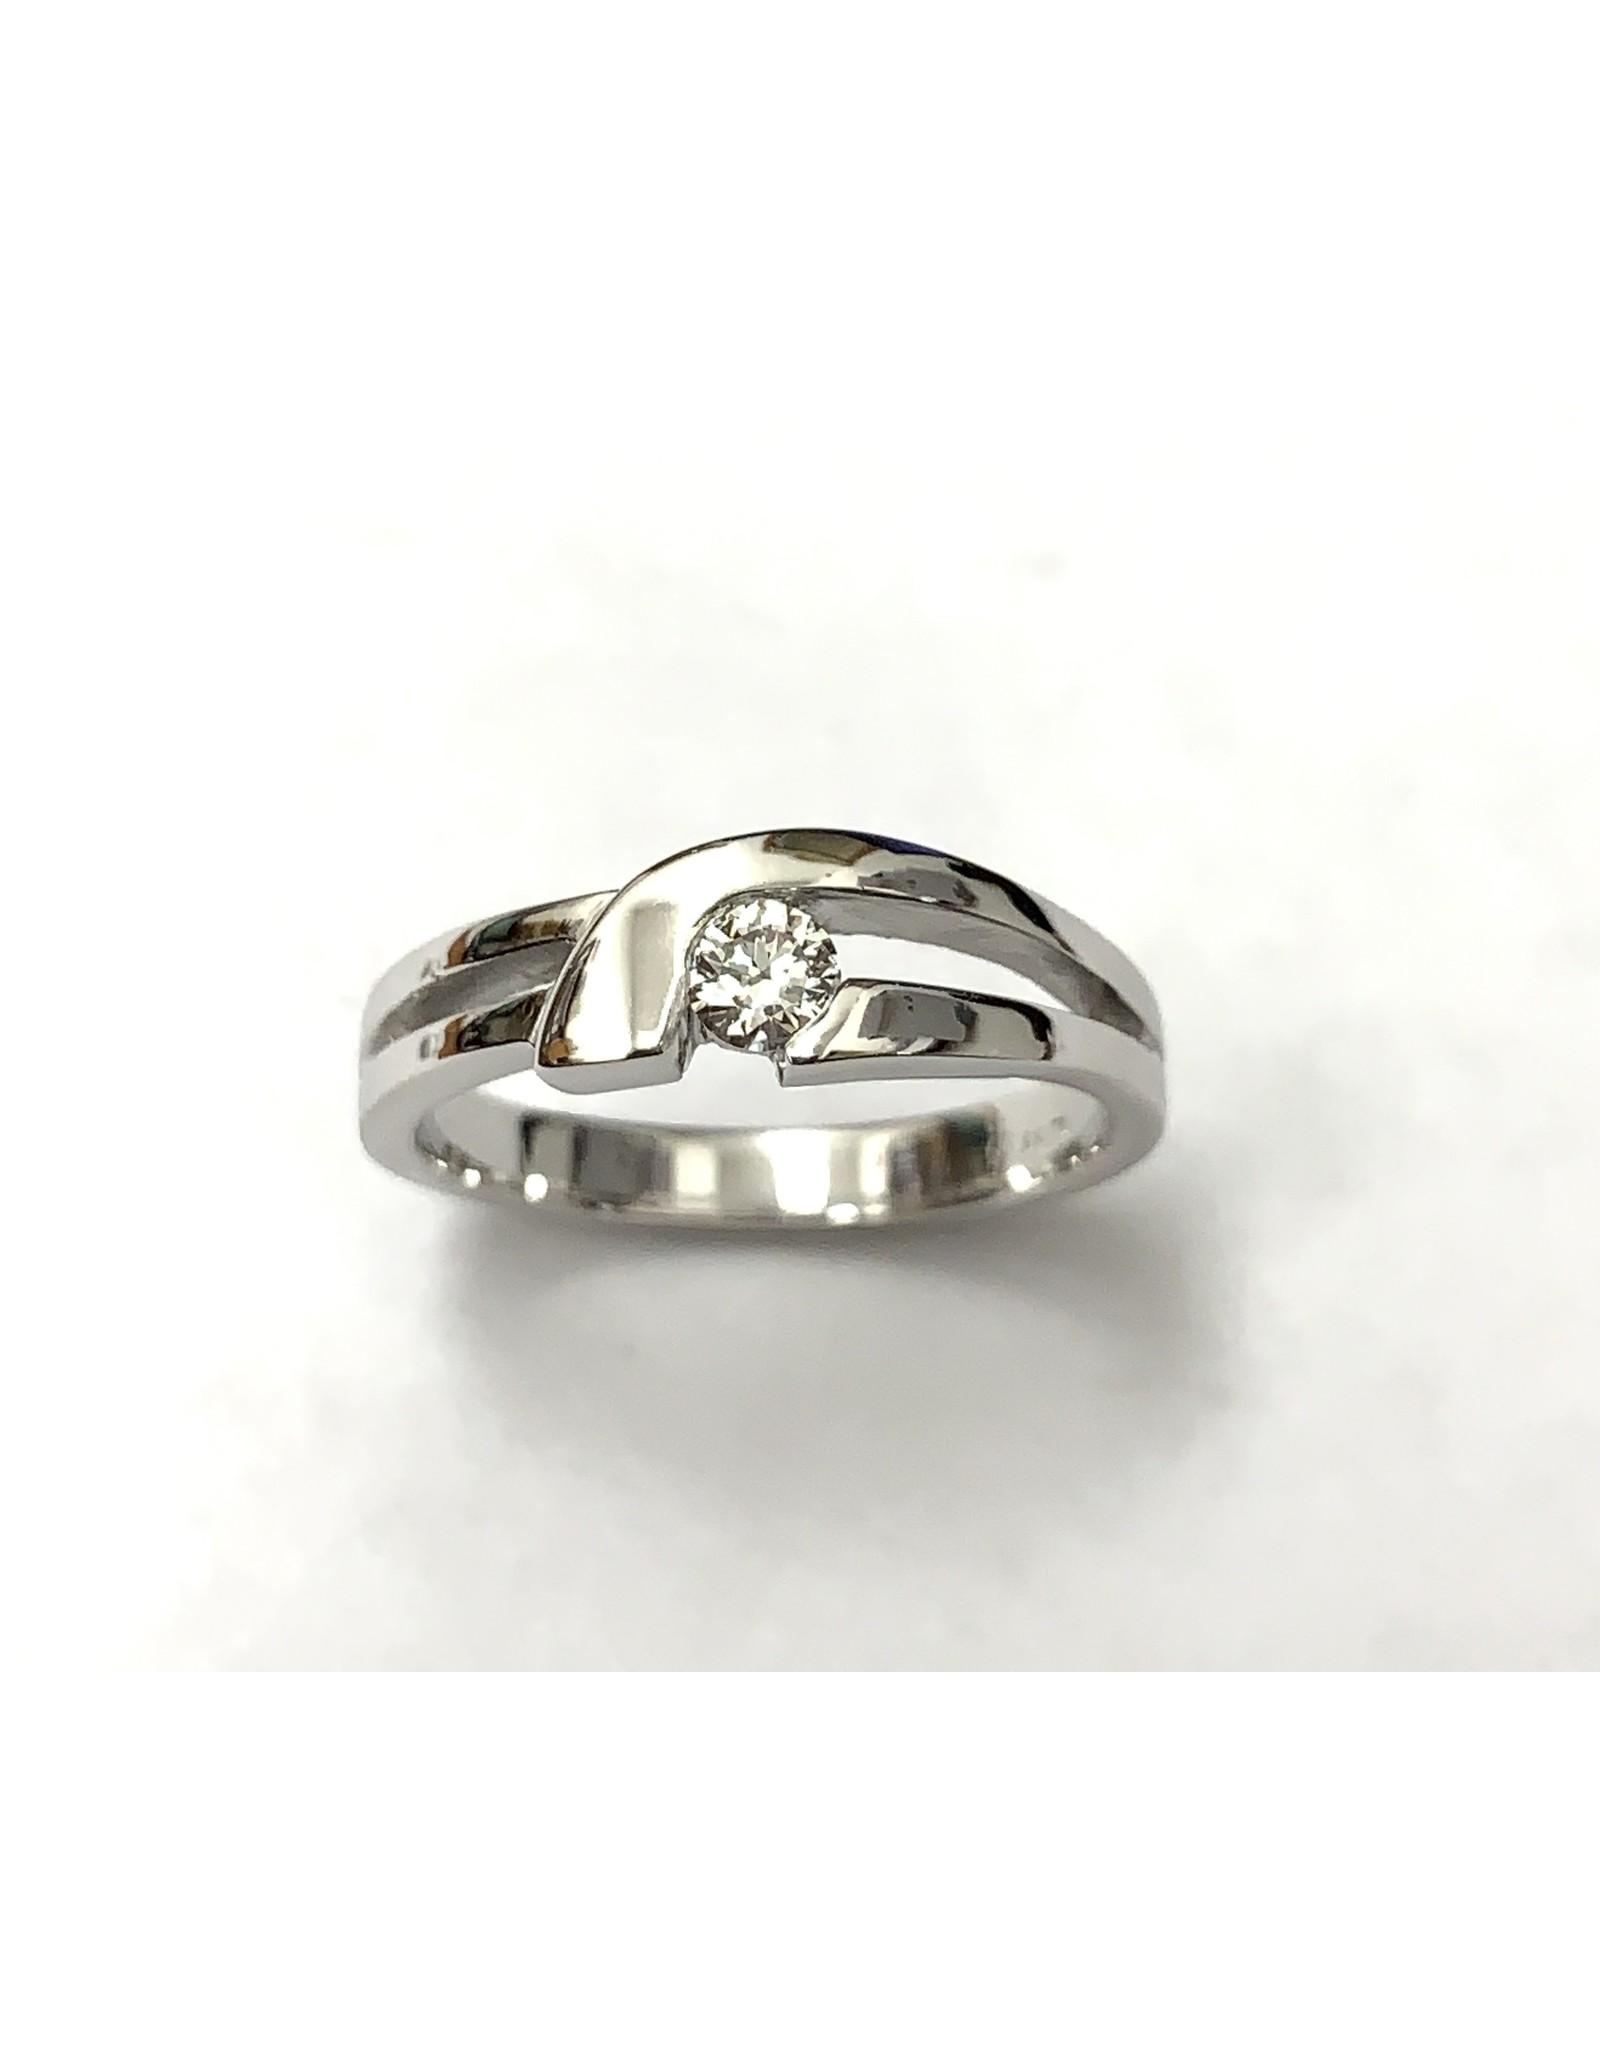 0.15ct Canadian Diamond Ring 14KW